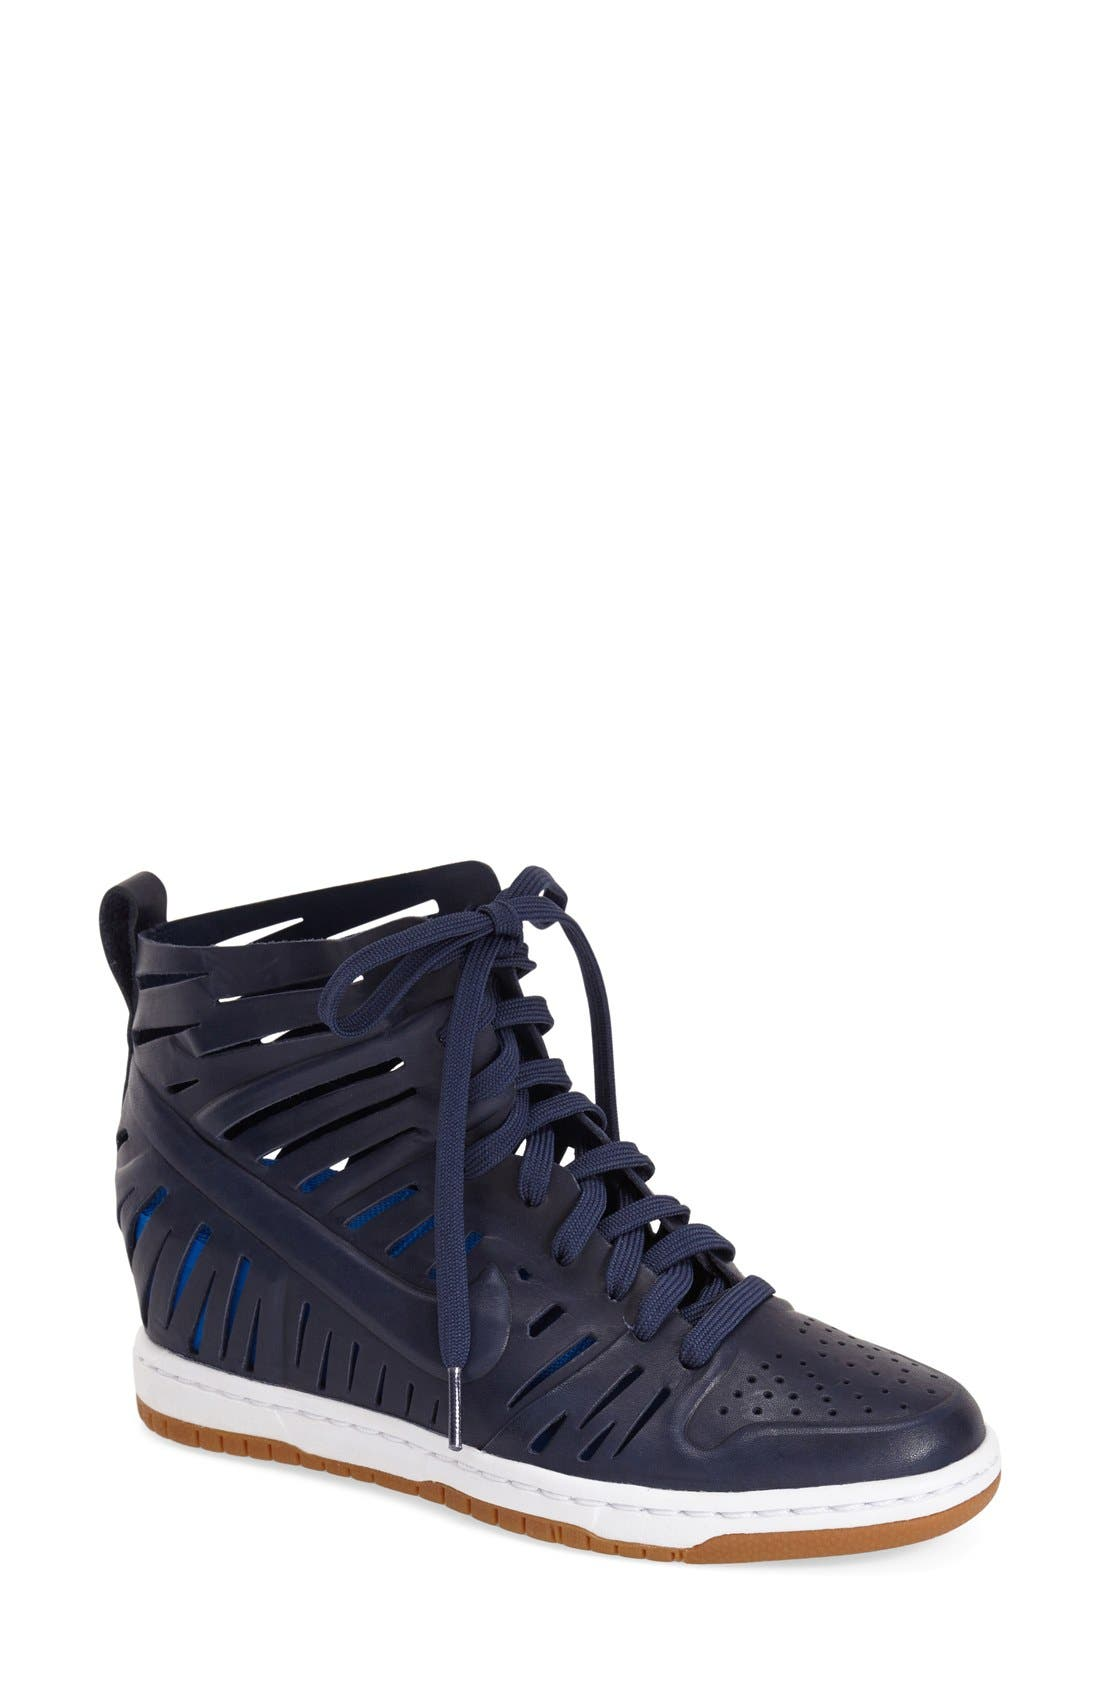 Alternate Image 1 Selected - Nike 'Dunk Sky Hi Joli' Hidden Wedge Sneaker (Women)